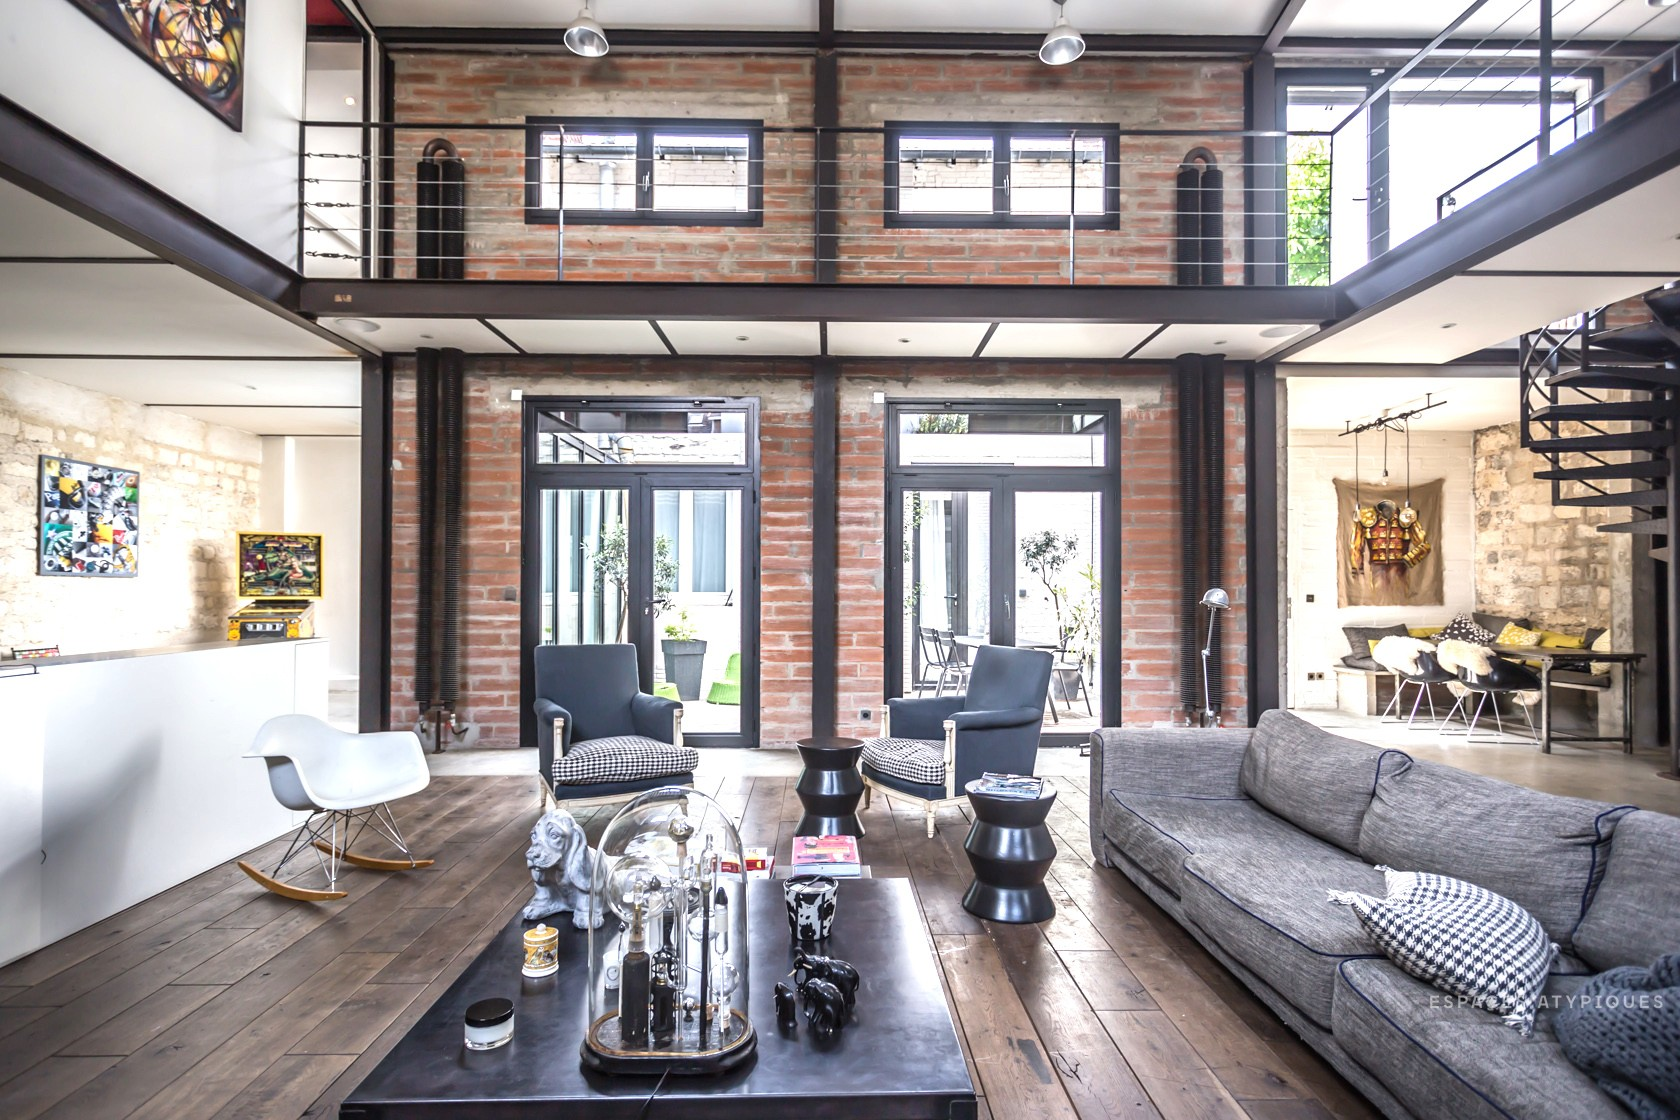 interior industrial loft style virlova style. Black Bedroom Furniture Sets. Home Design Ideas